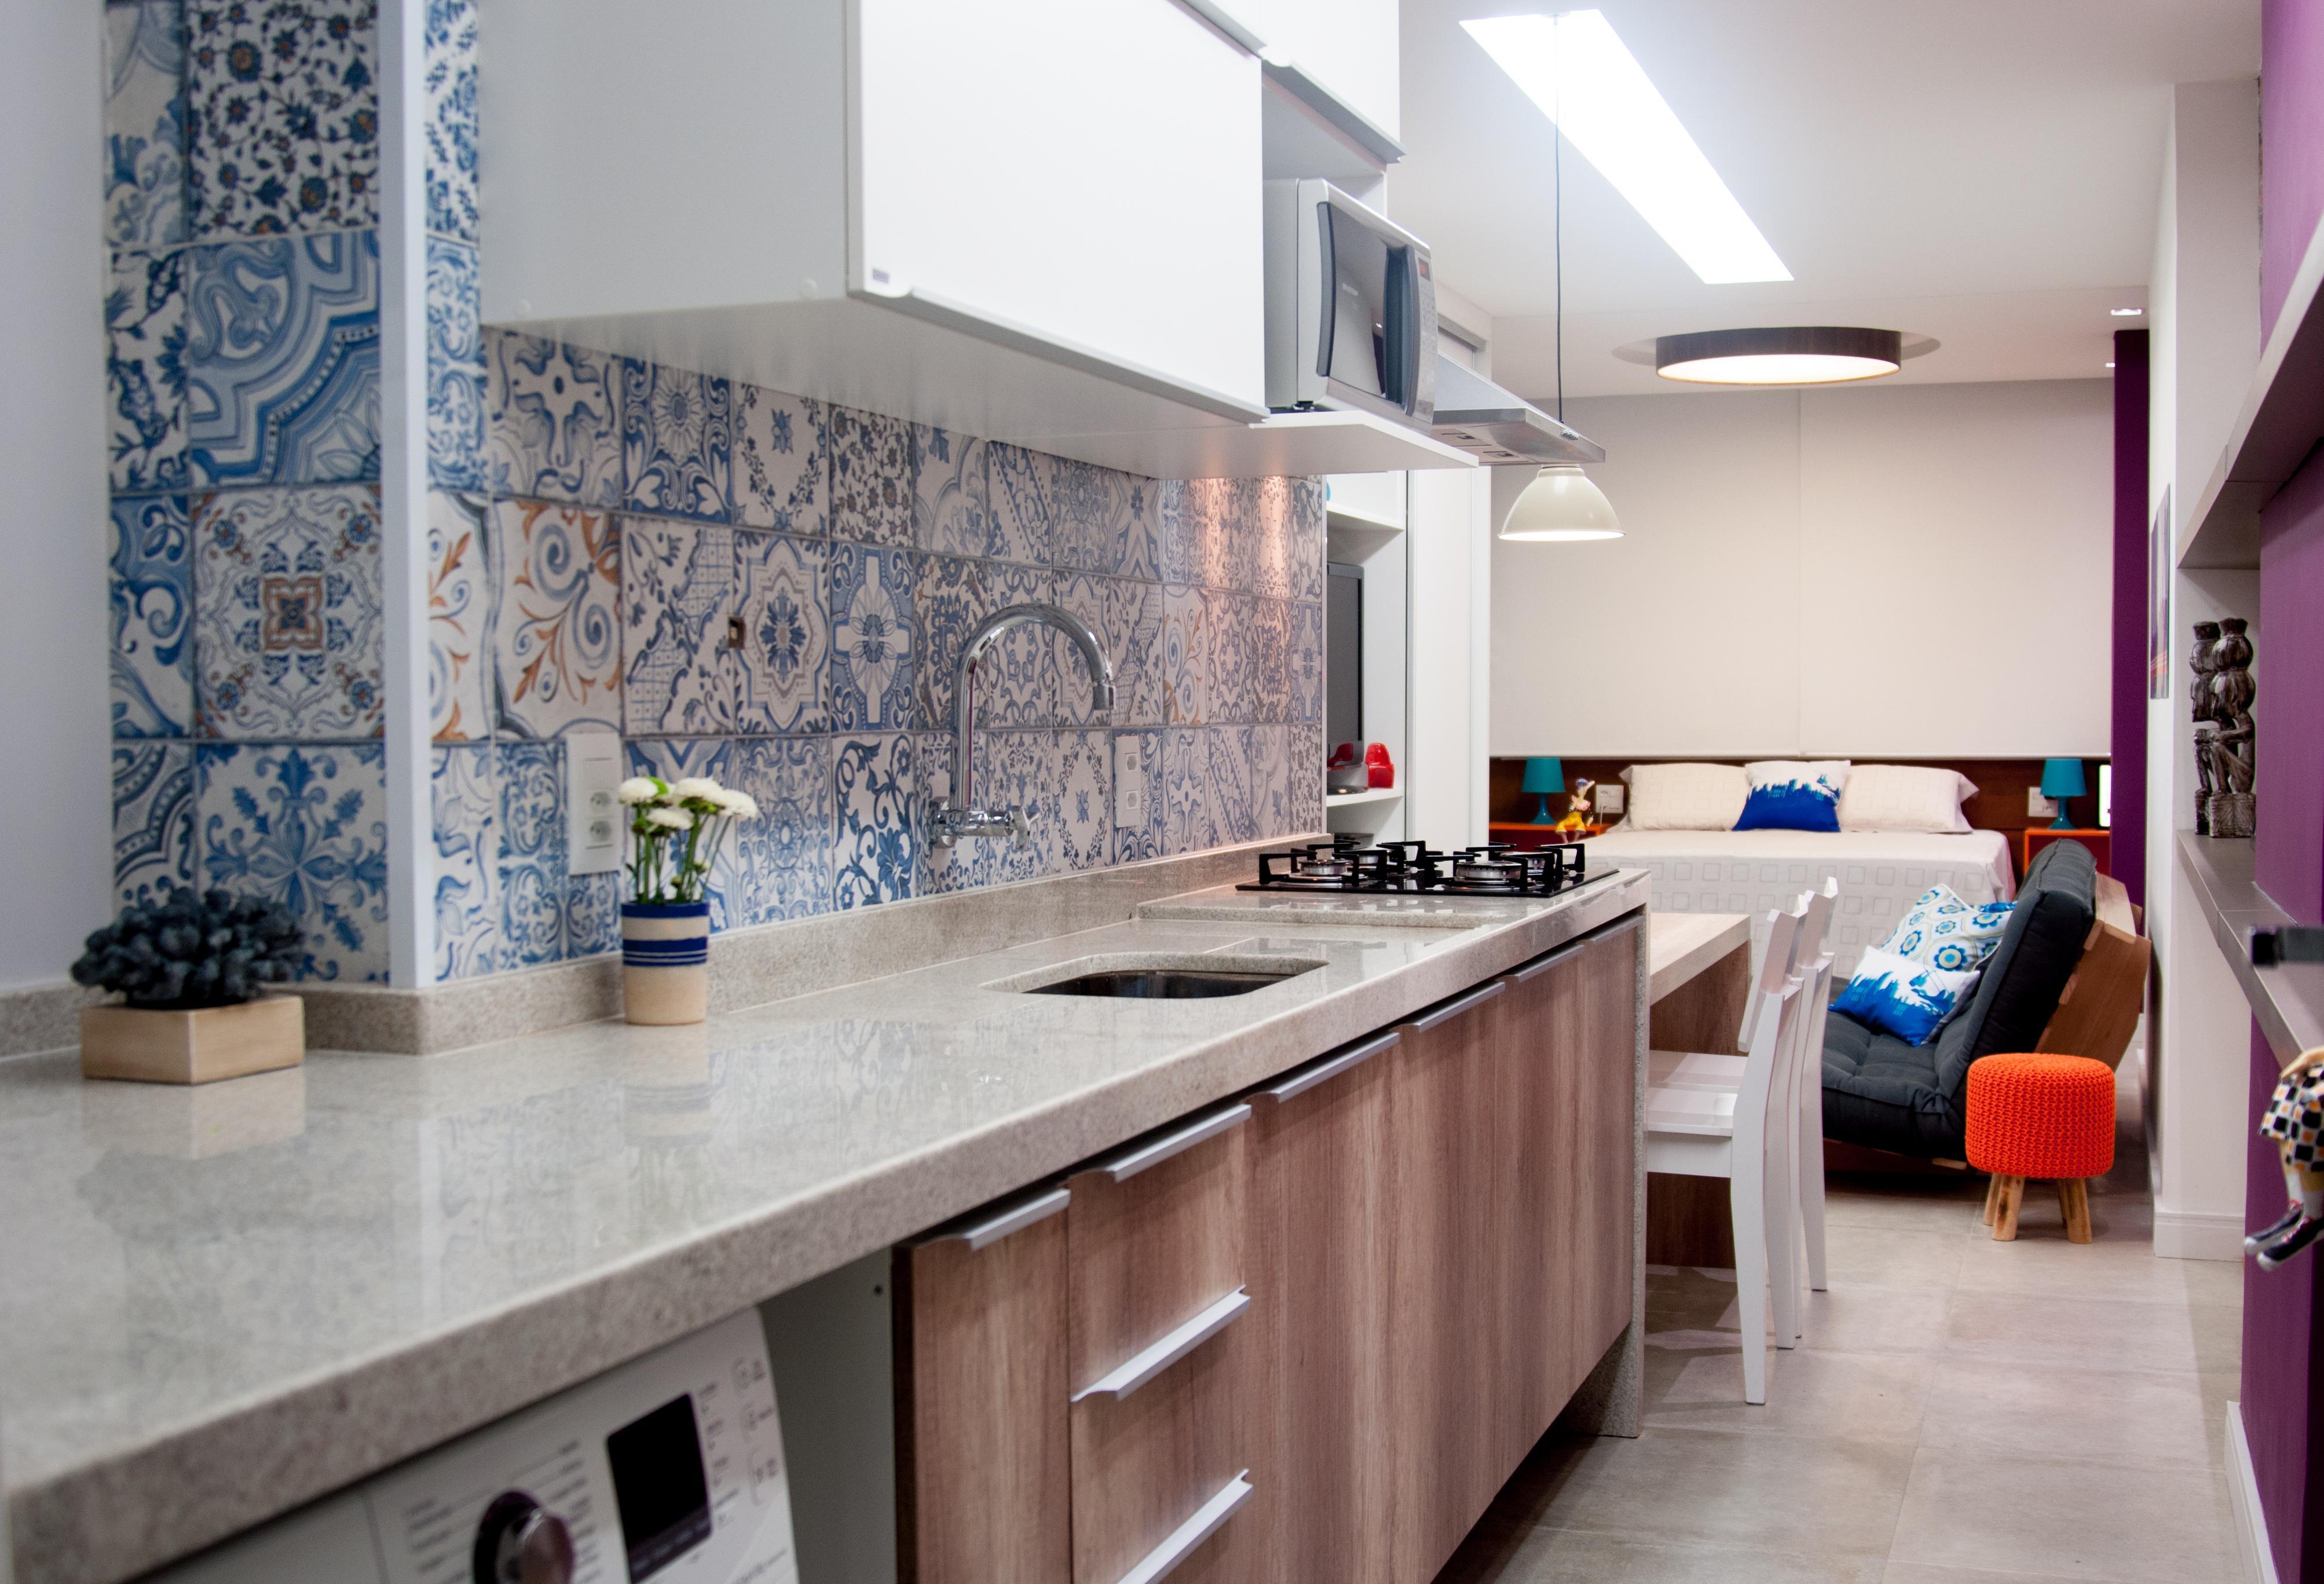 Azulejo portugu s na decora o 60 fotos inspiradoras for Casa del azulejo